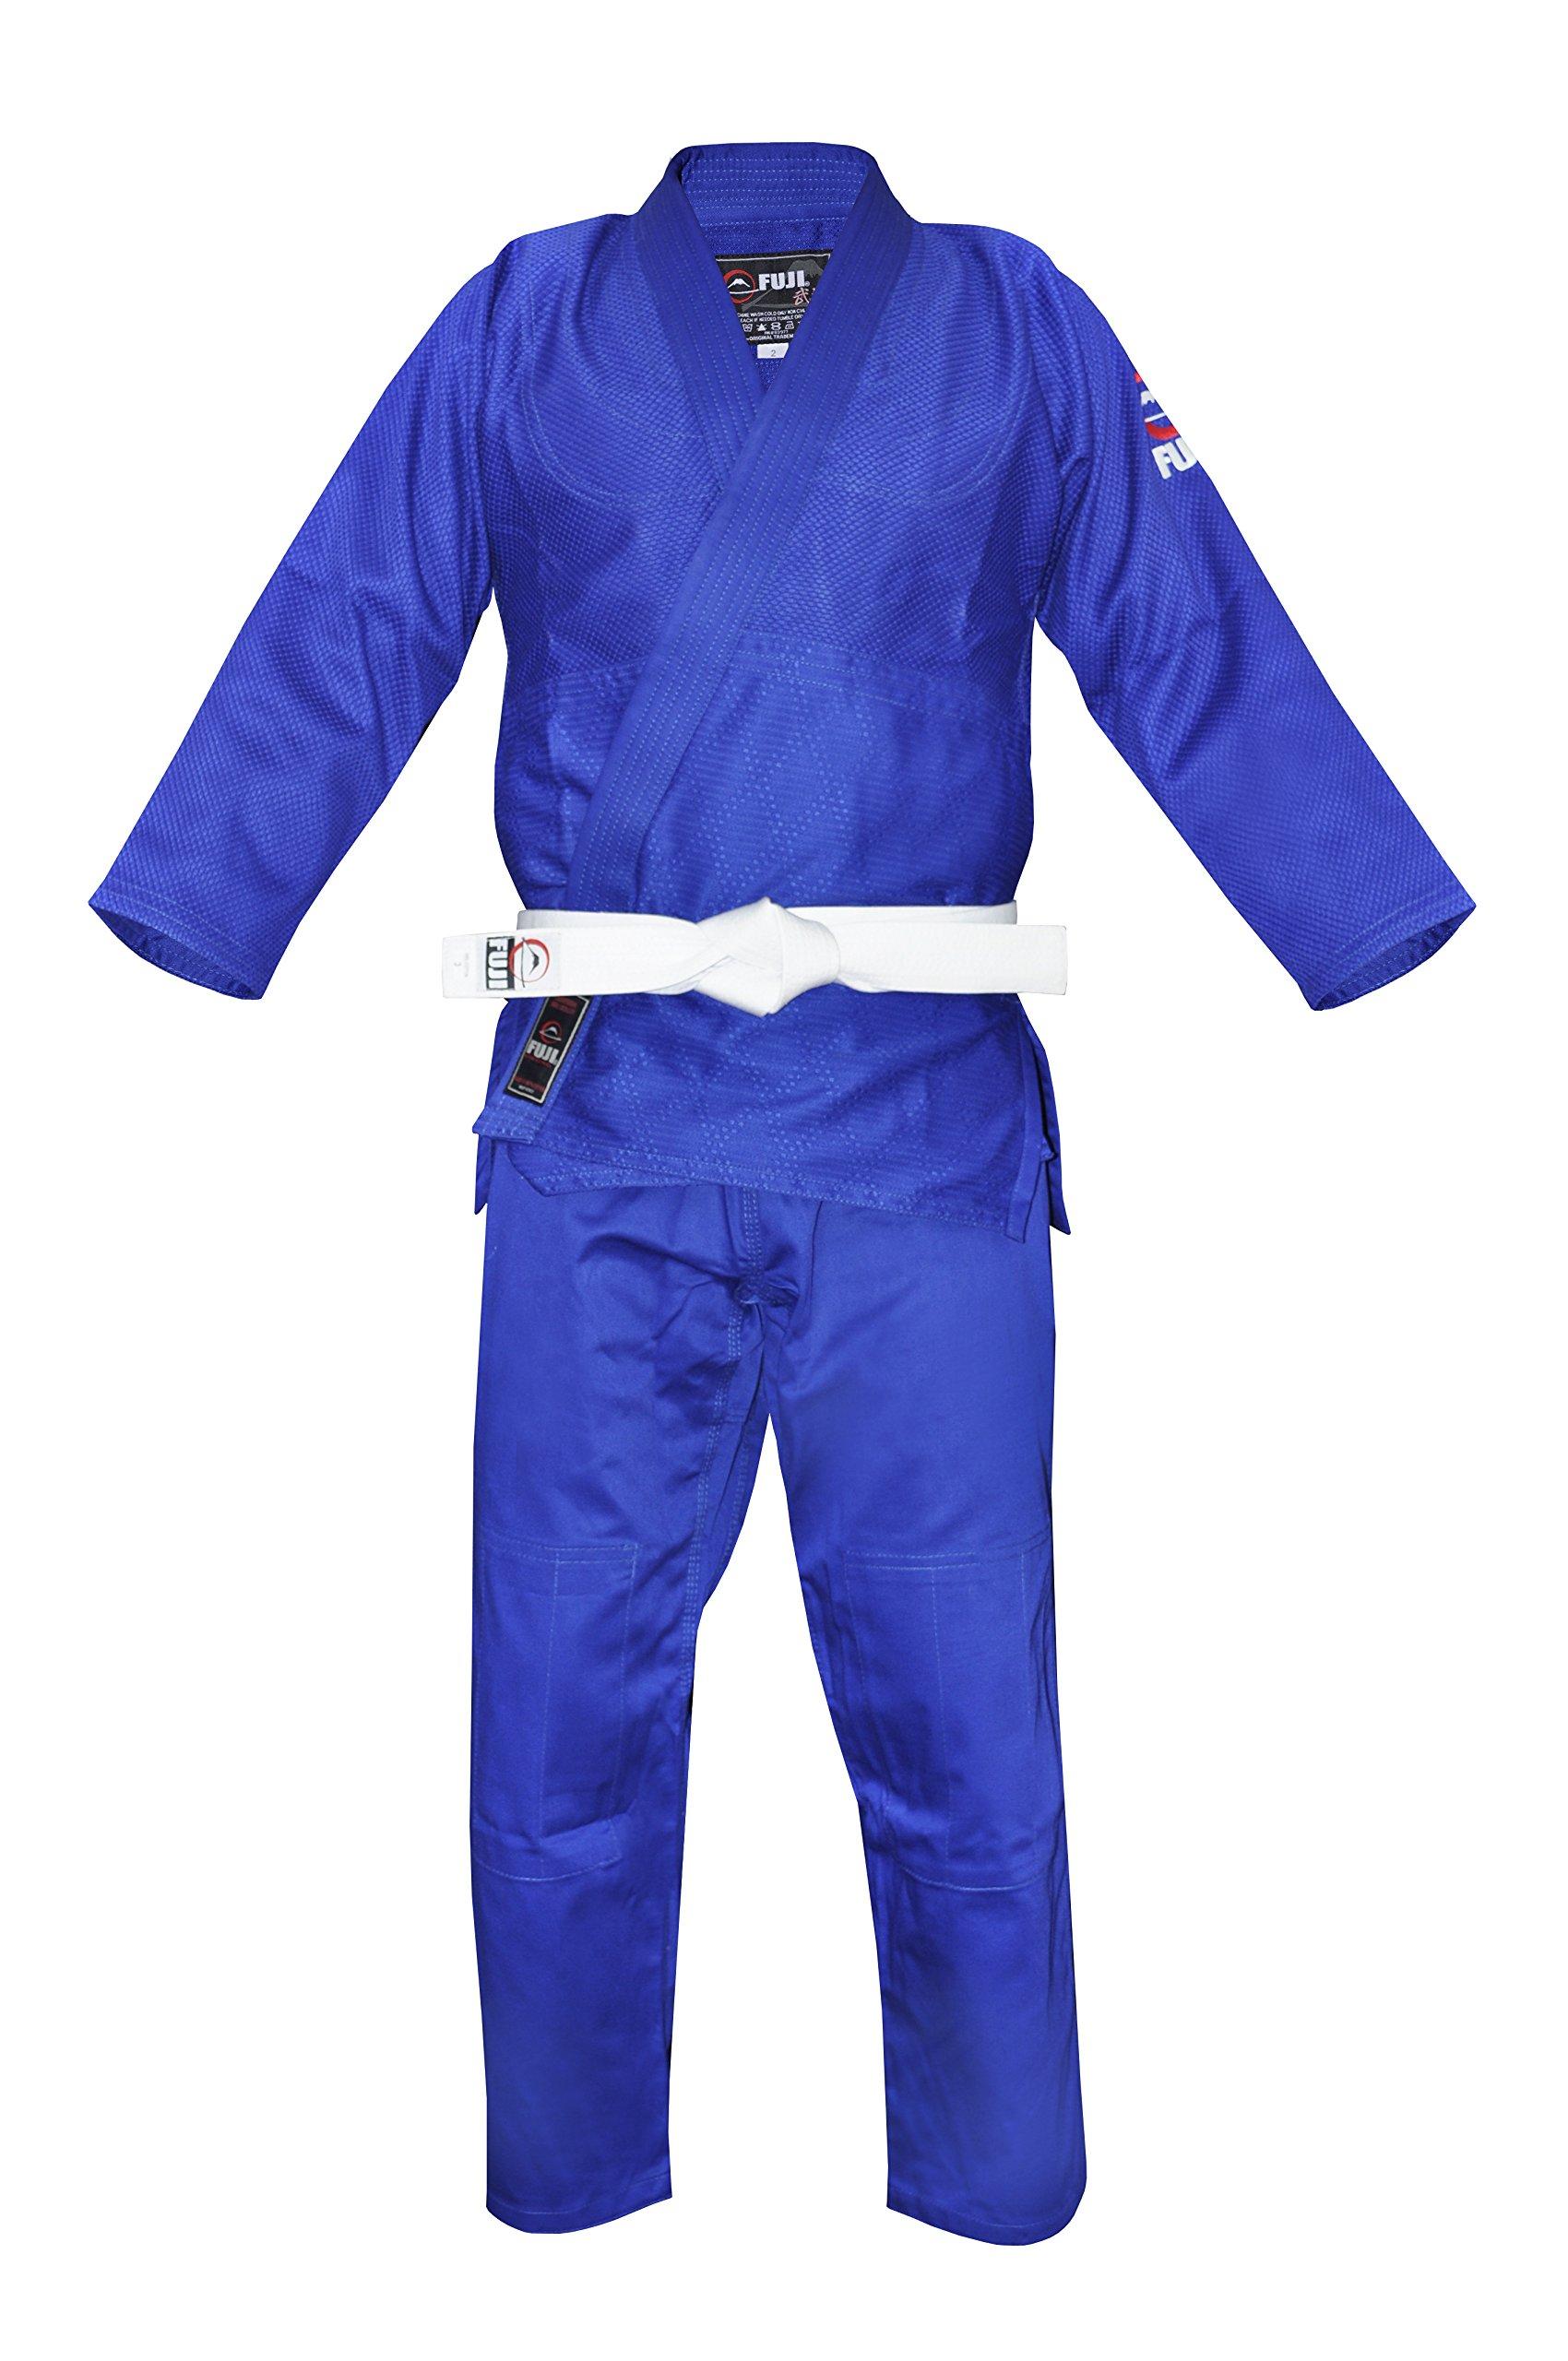 FUJI Single Weave Judo GI, Blue, 3 by Fuji